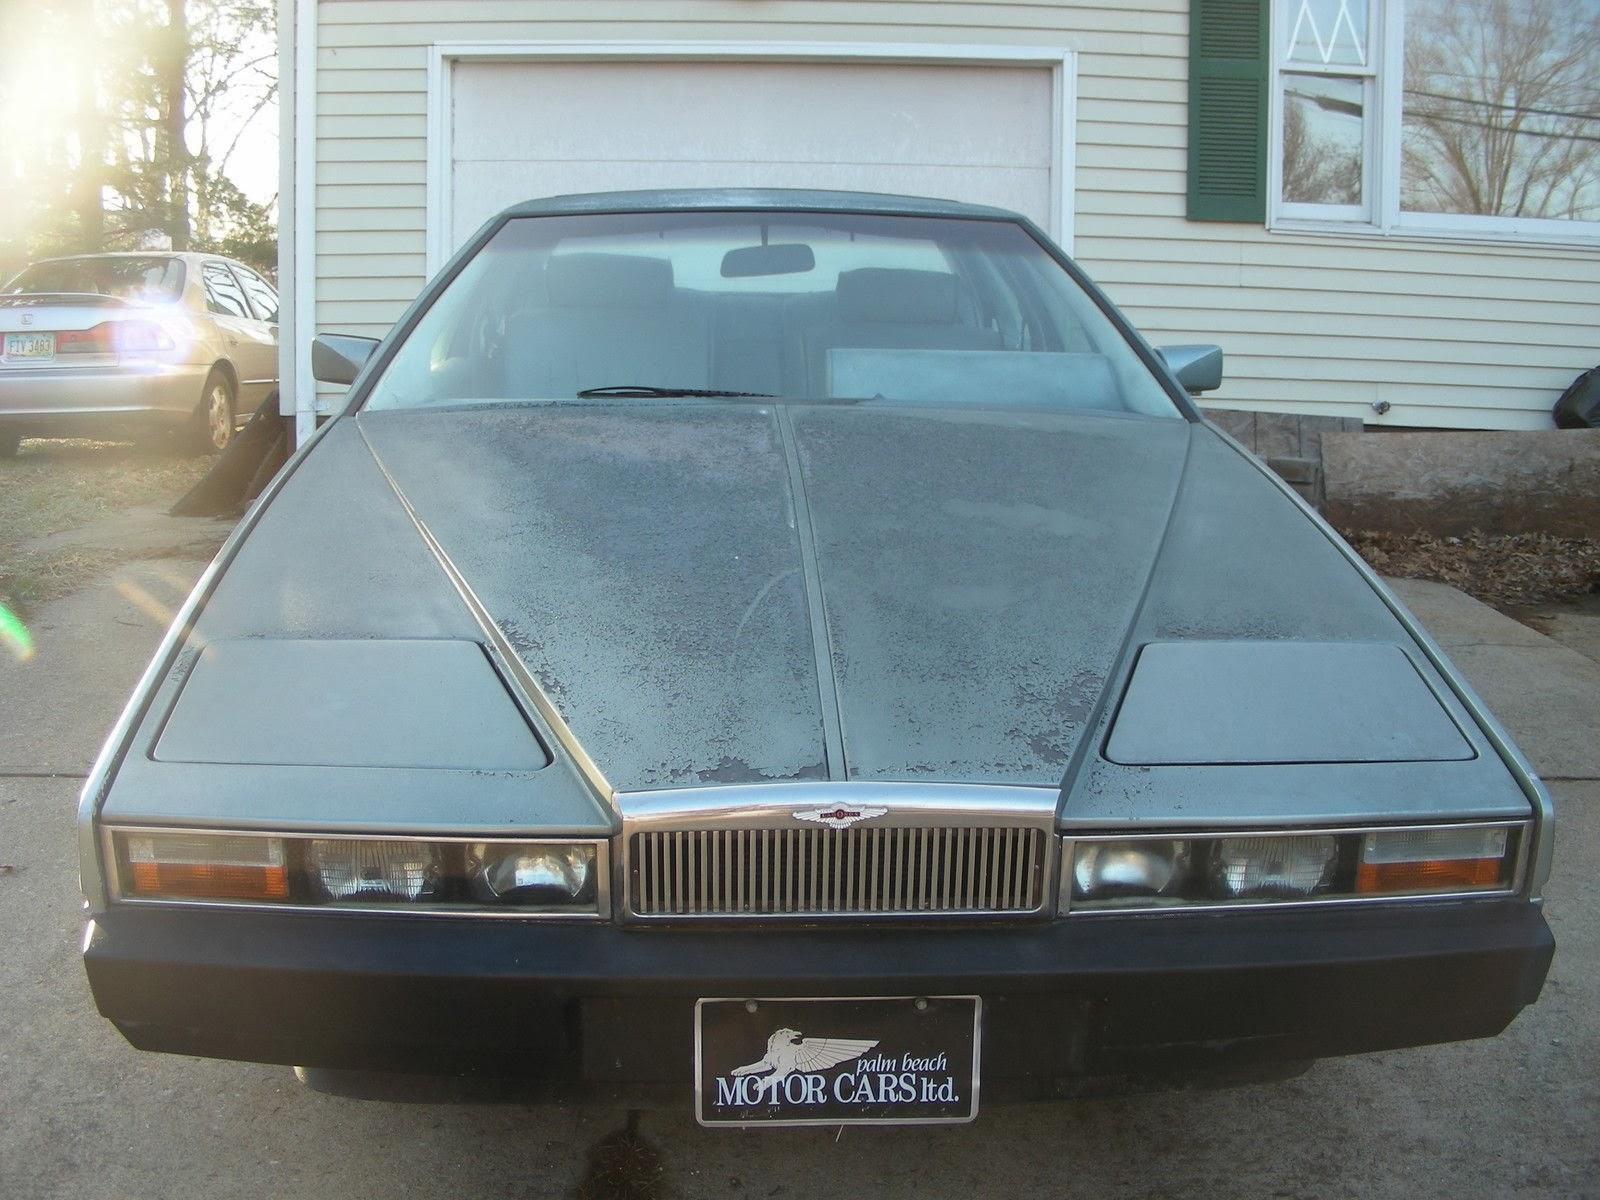 just a car geek: 1983 aston martin lagonda - a scary project